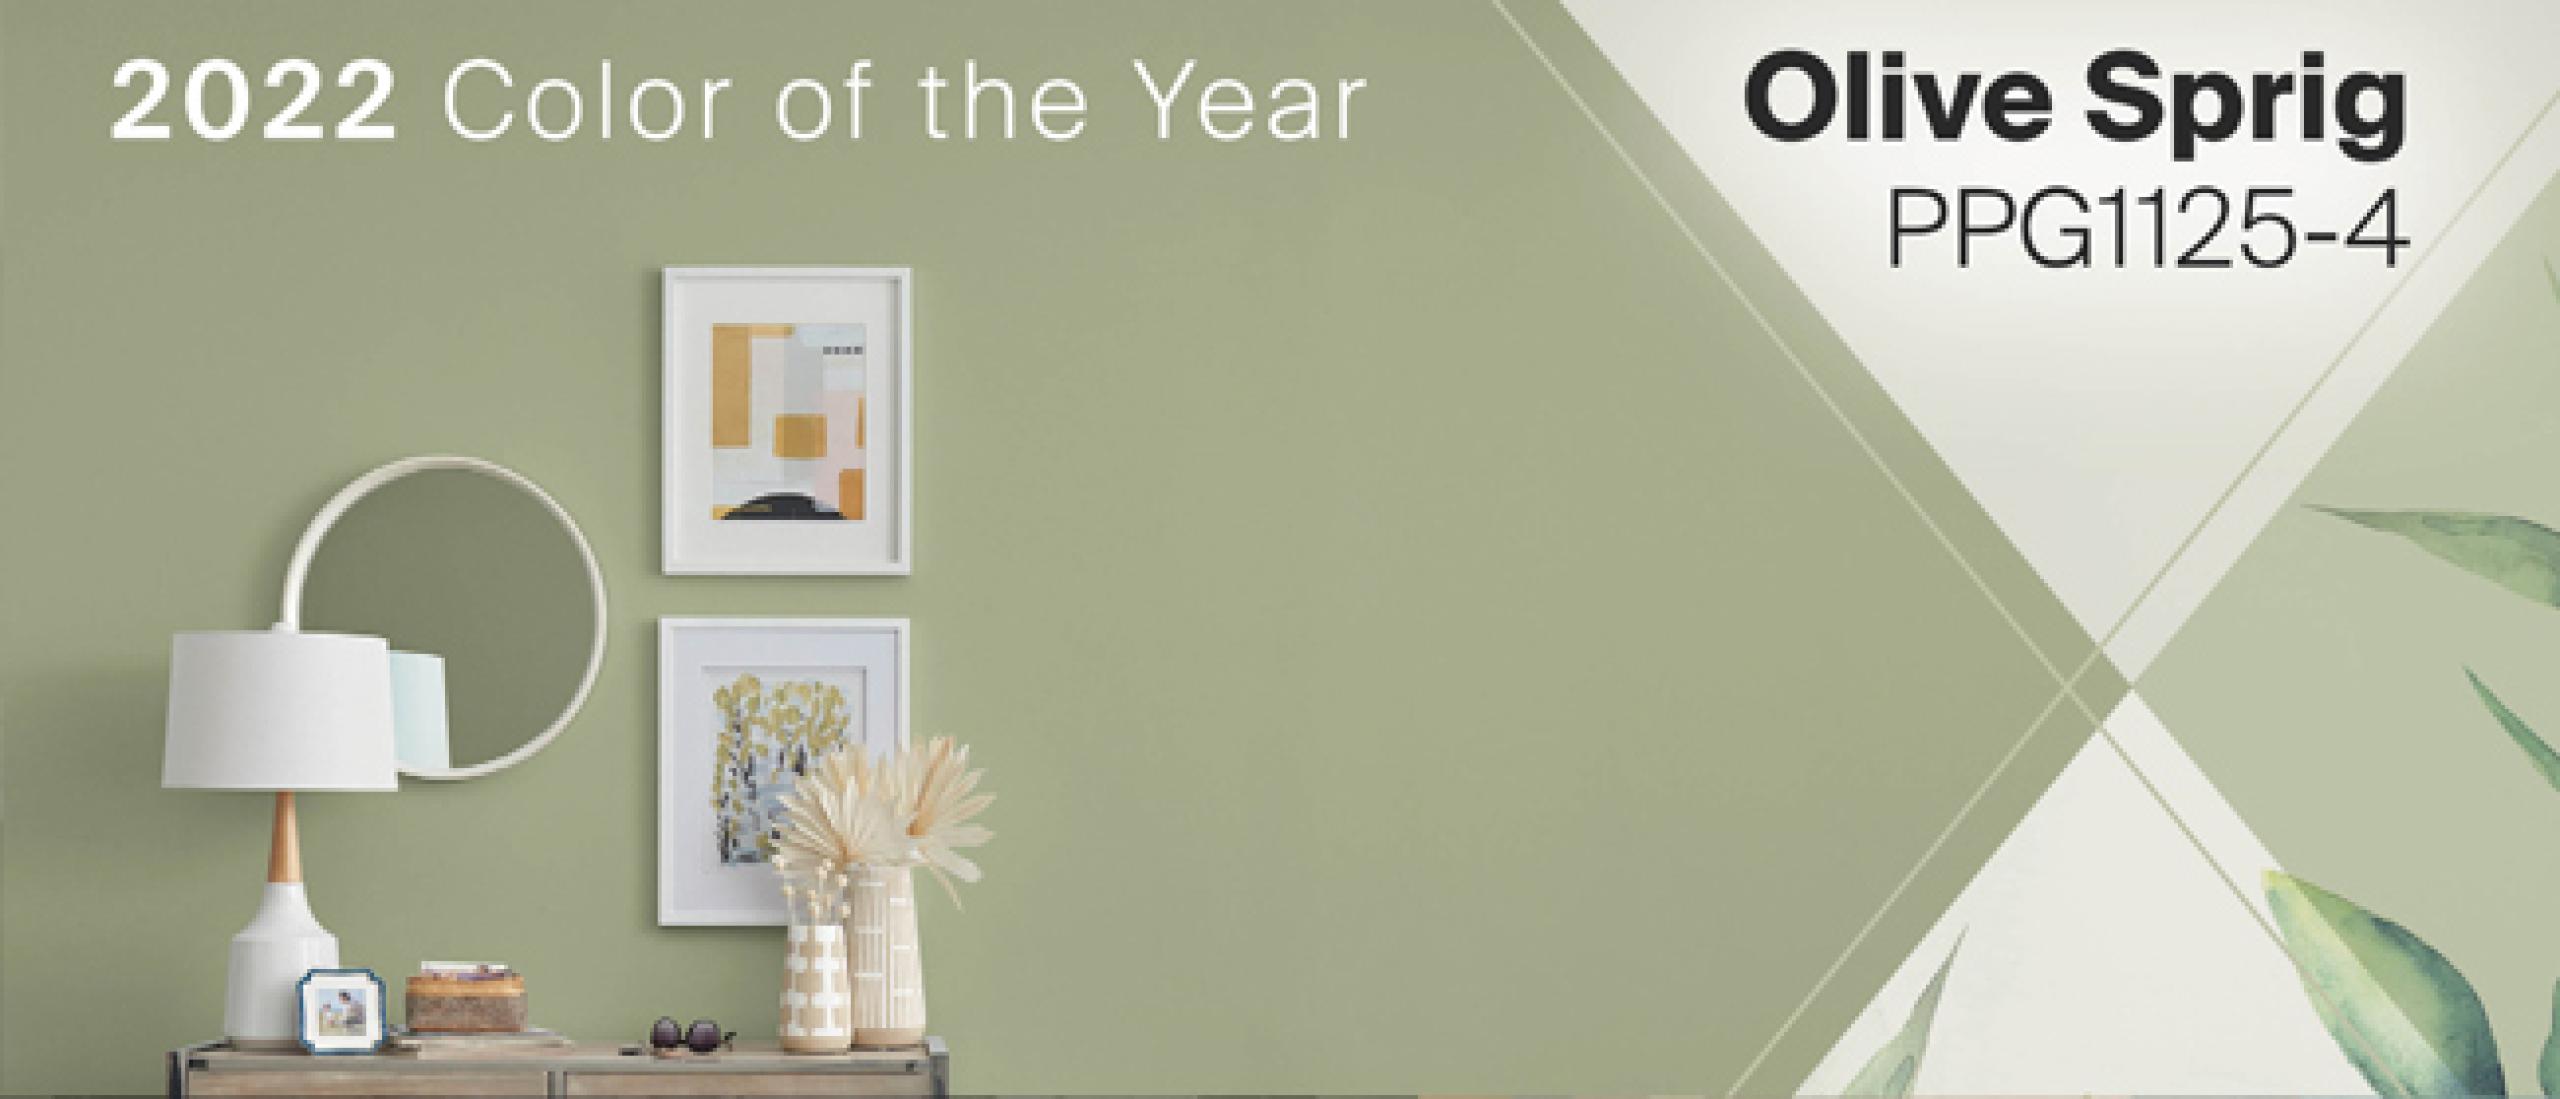 PPG's Kleur van het Jaar 2022 : Olive Sprig